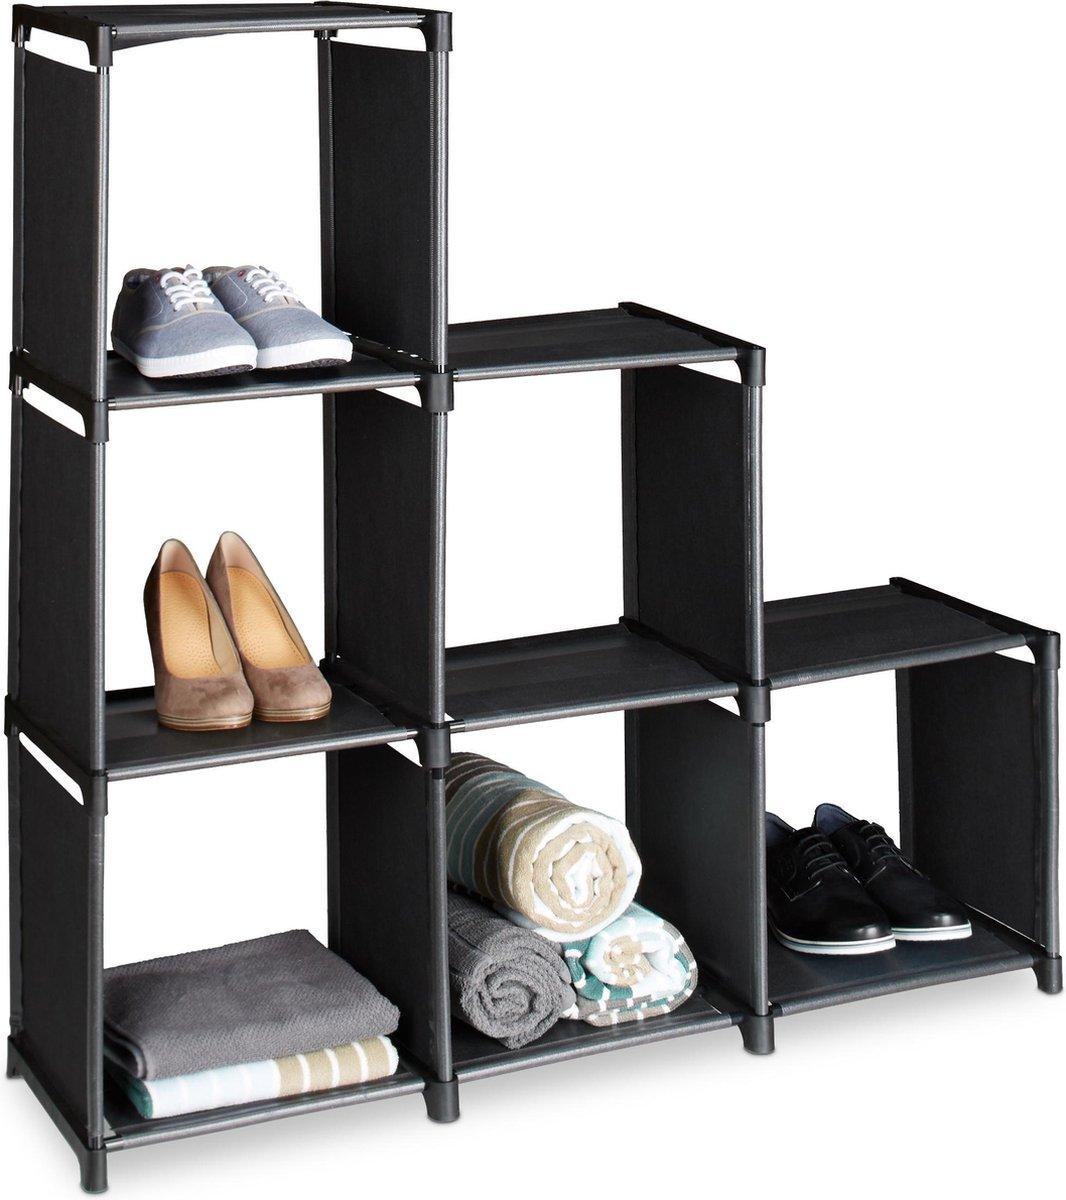 relaxdays vakkenkast 6 vakken trapsgewijs - roomdivider - steekverbinding - ruimteverdeler zwart - Relaxdays